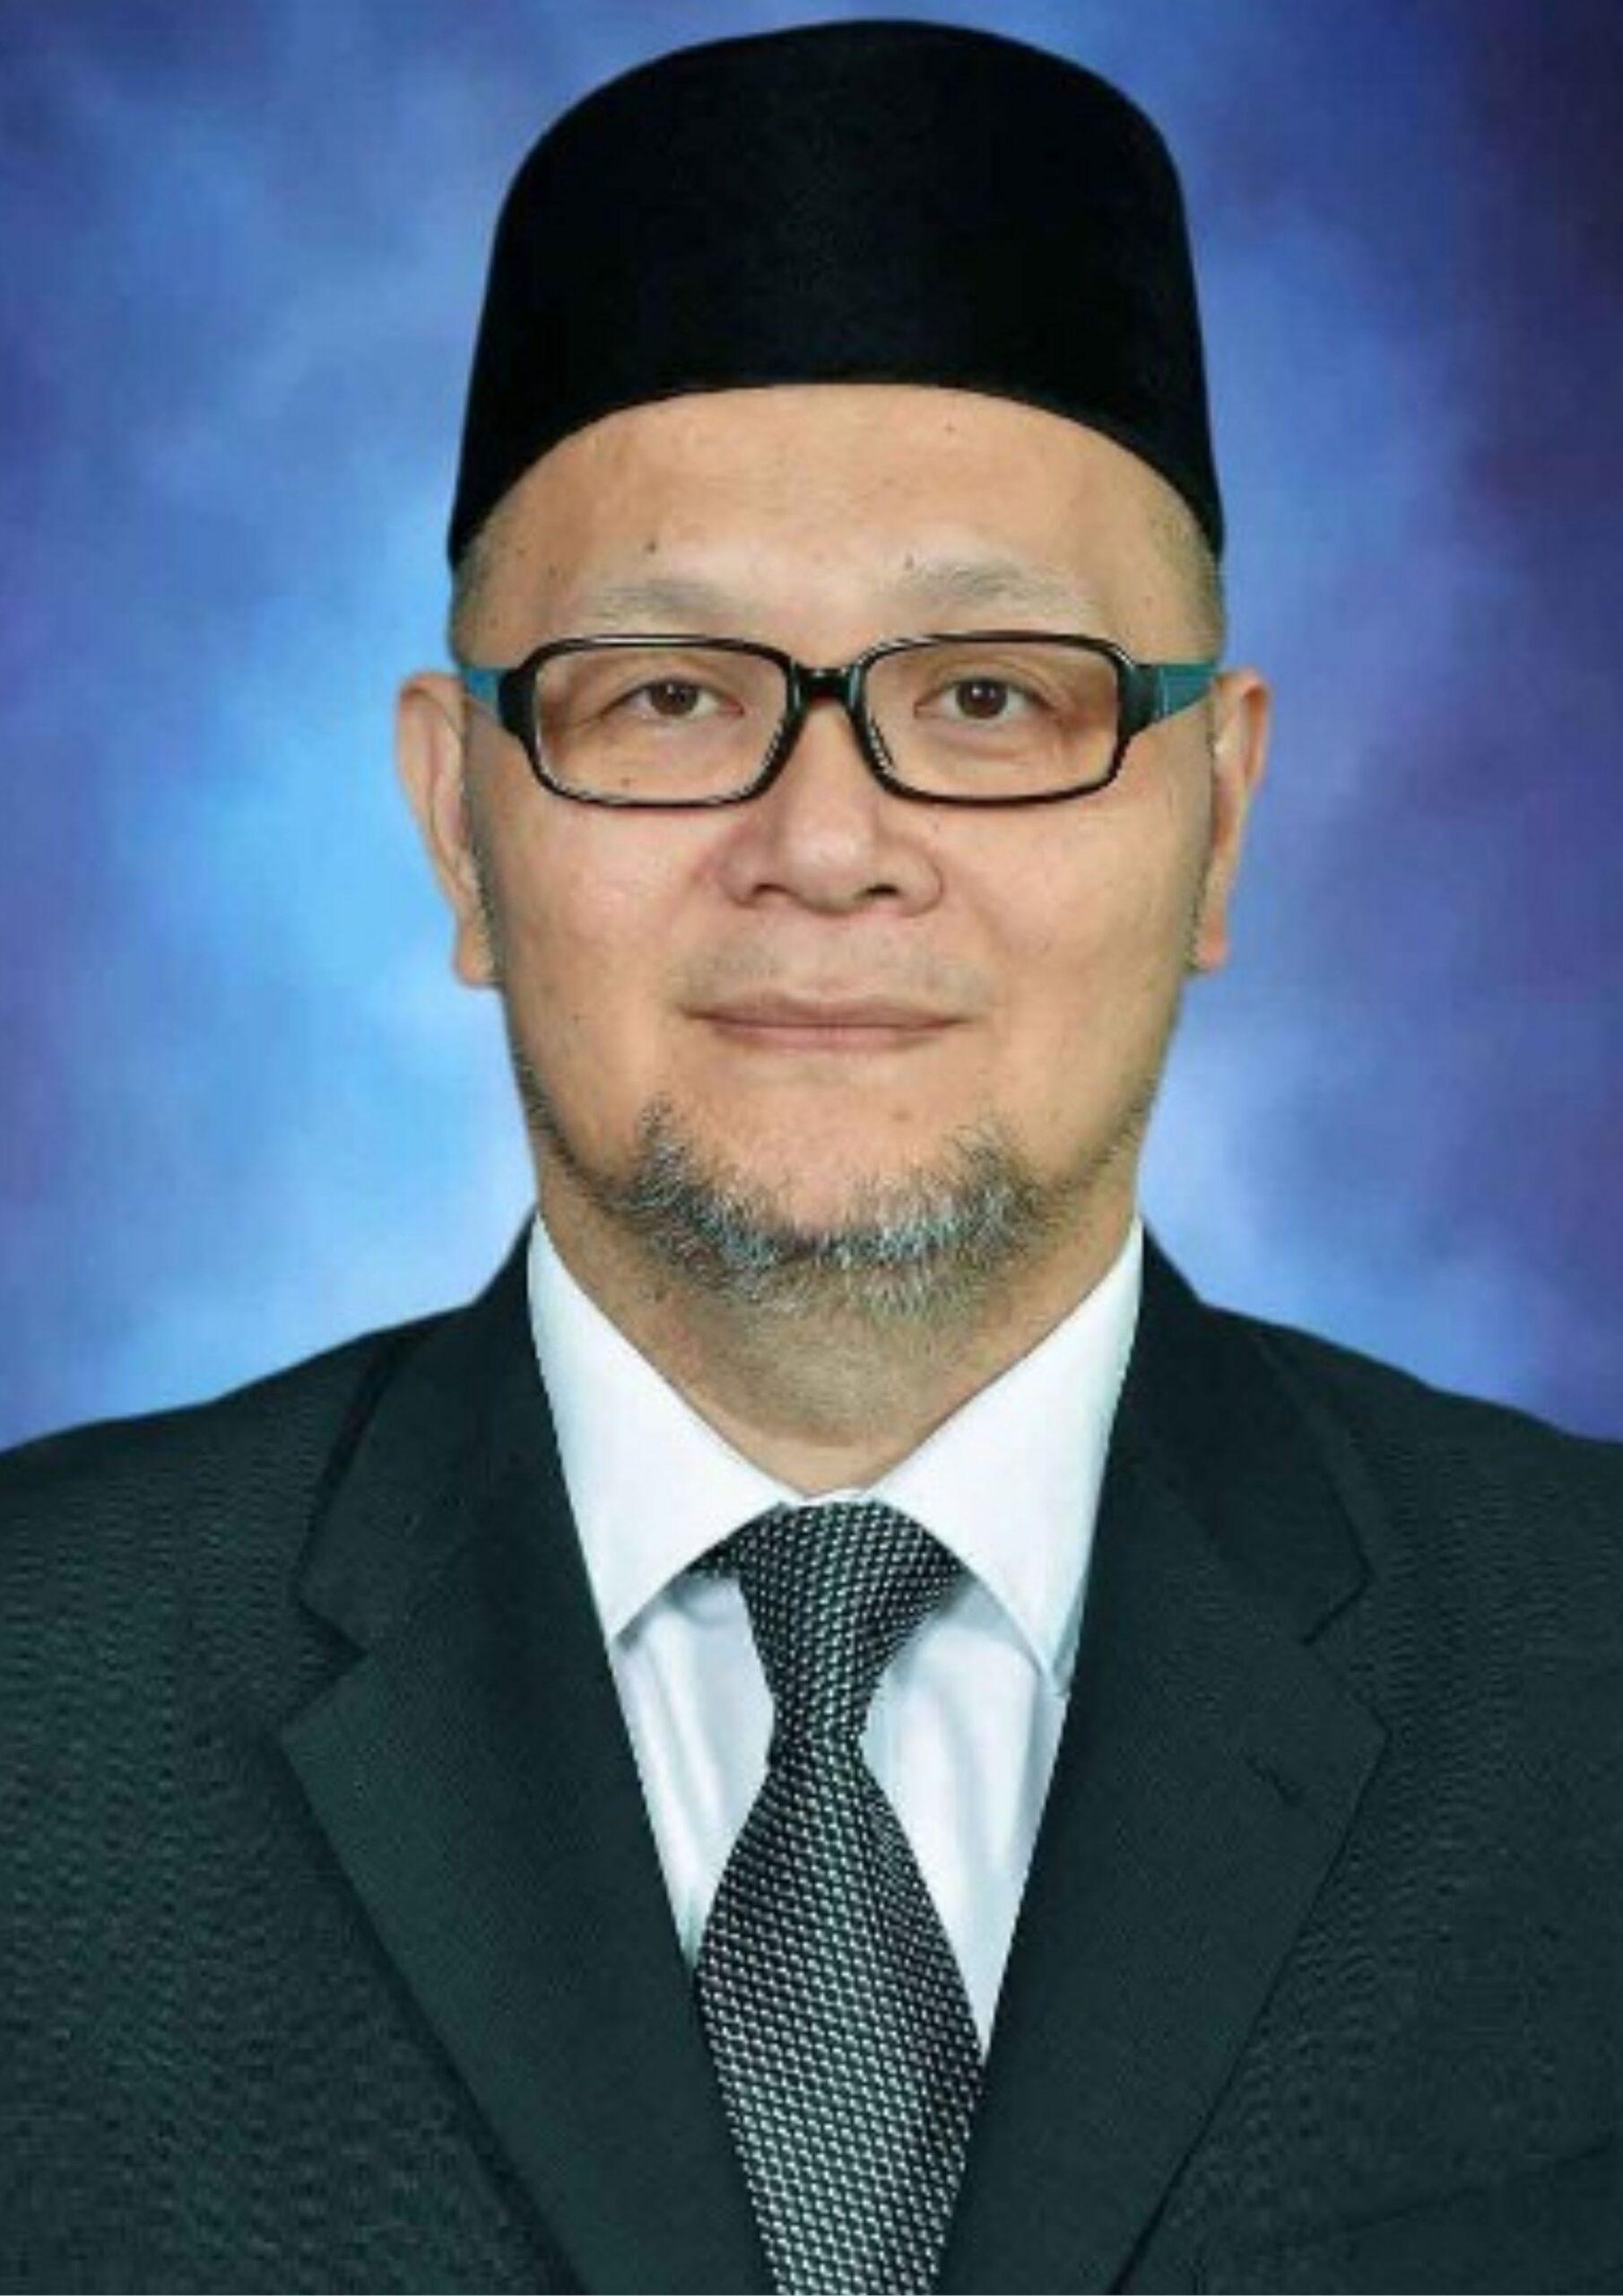 H E Dato Seri Setia Awang Hj Hamzah bin Hj Sulaiman